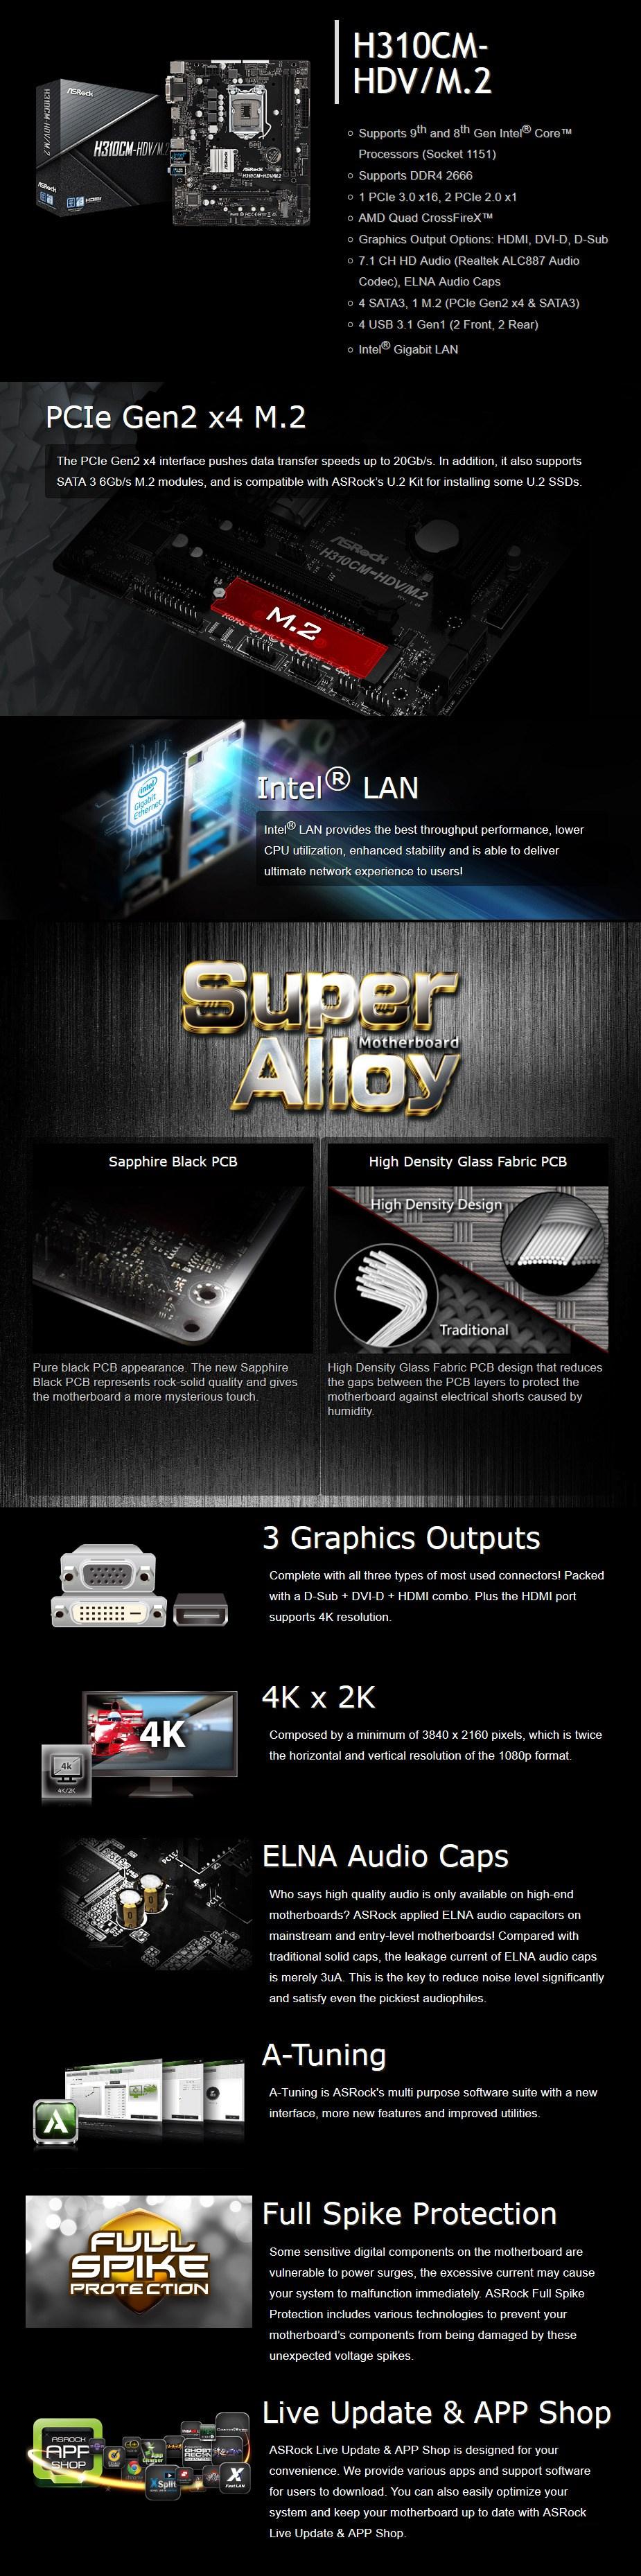 ASRock H310CM-HDV/M.2 LGA 1151 M-ATX Motherboard - Desktop Overview 1